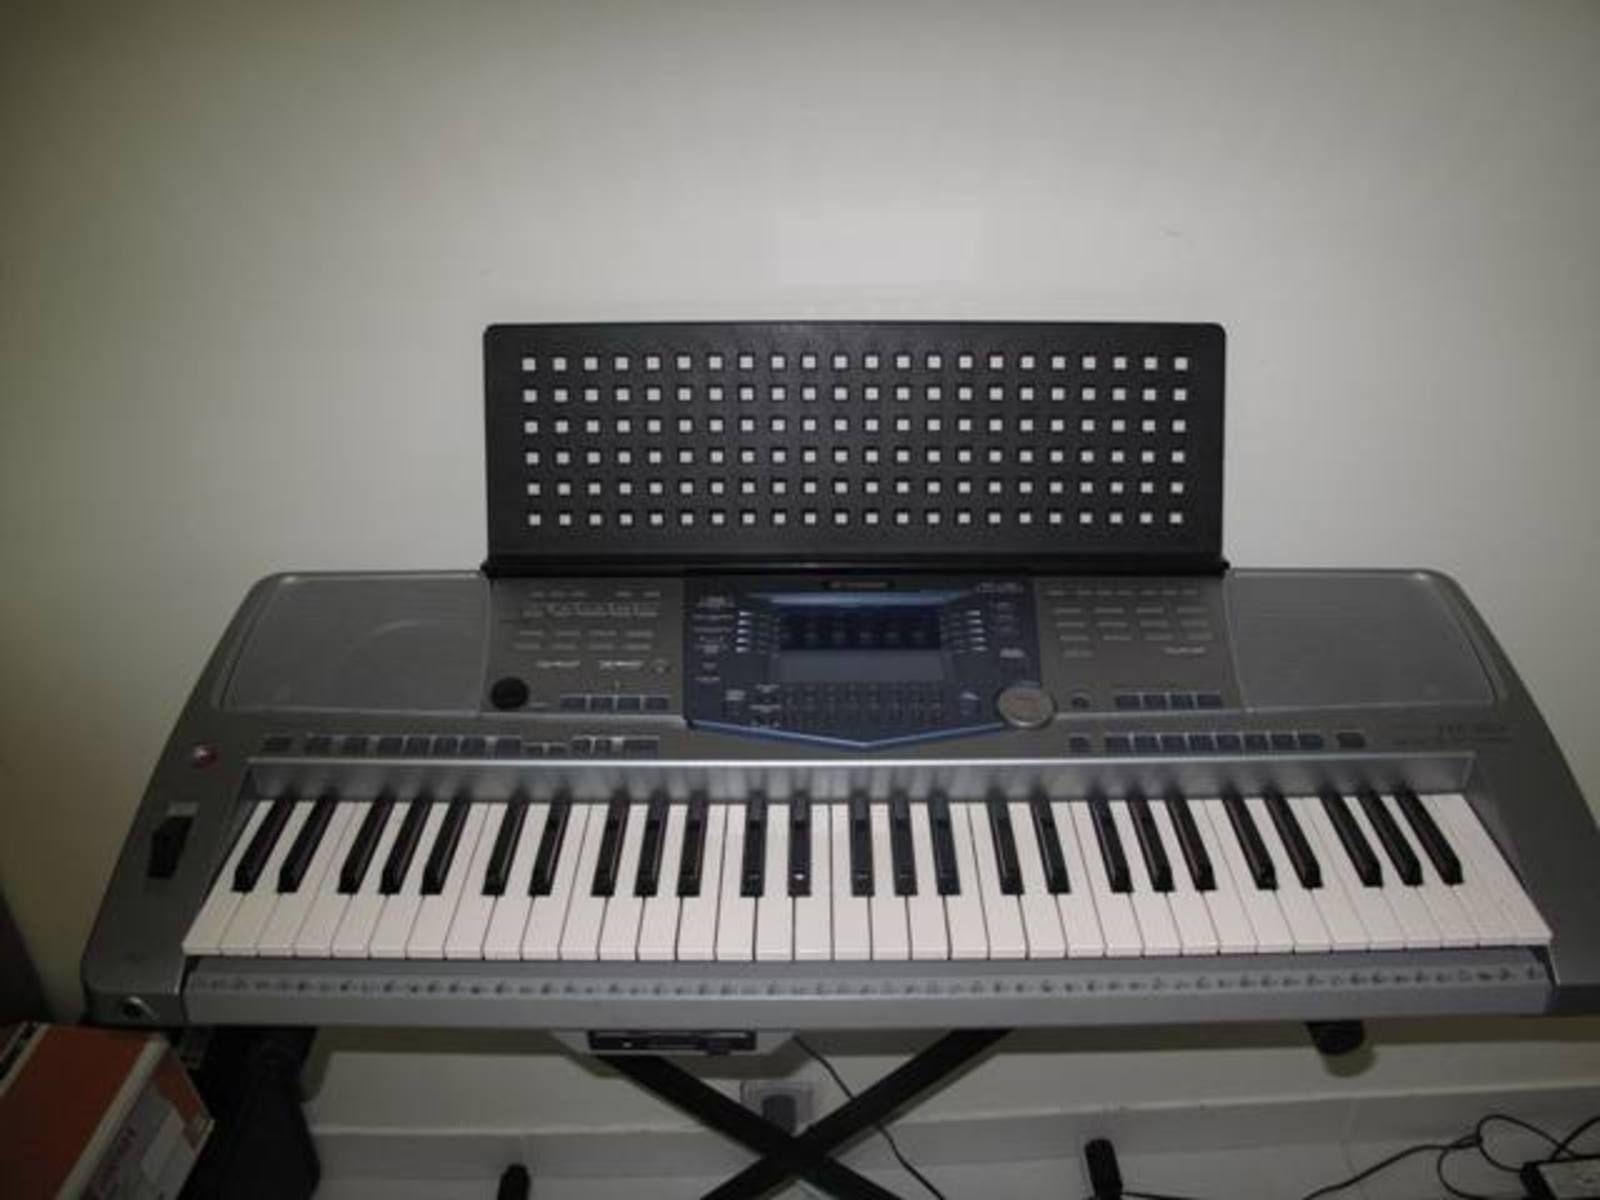 Yamaha psr 1100 image 23835 audiofanzine for Yamaha psr 410 keyboard